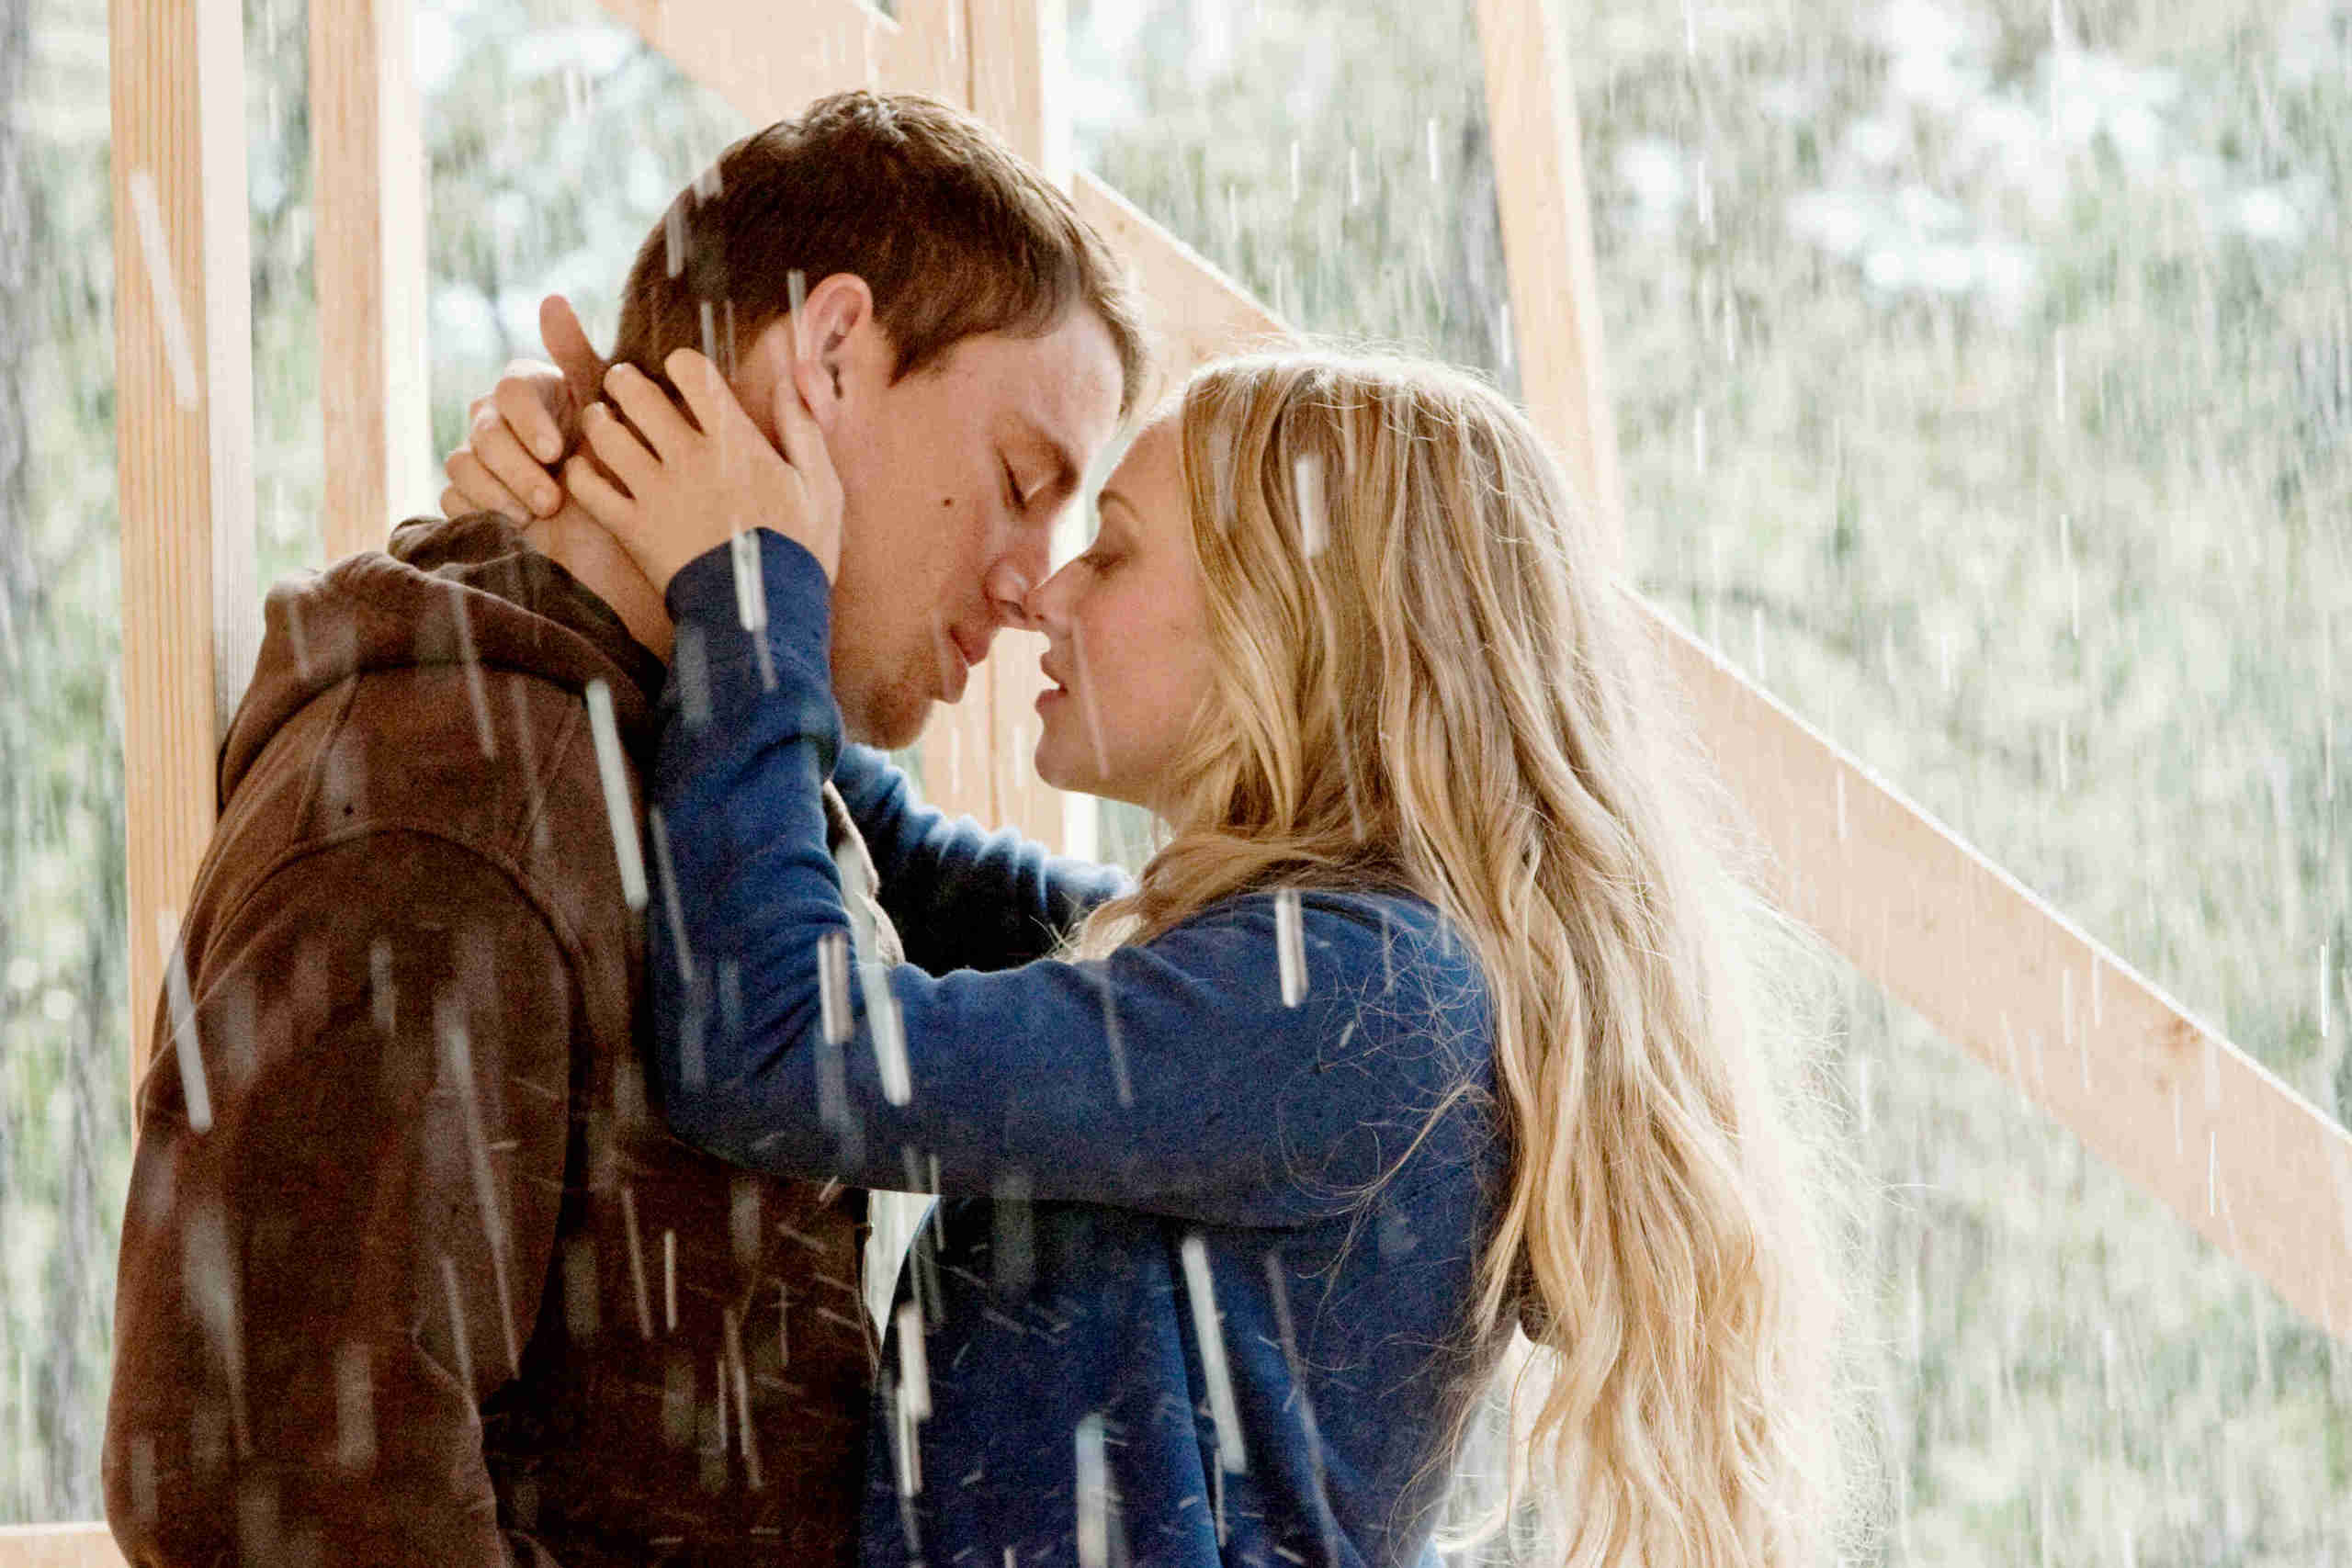 aşk, sevgi, romantik, romantizm